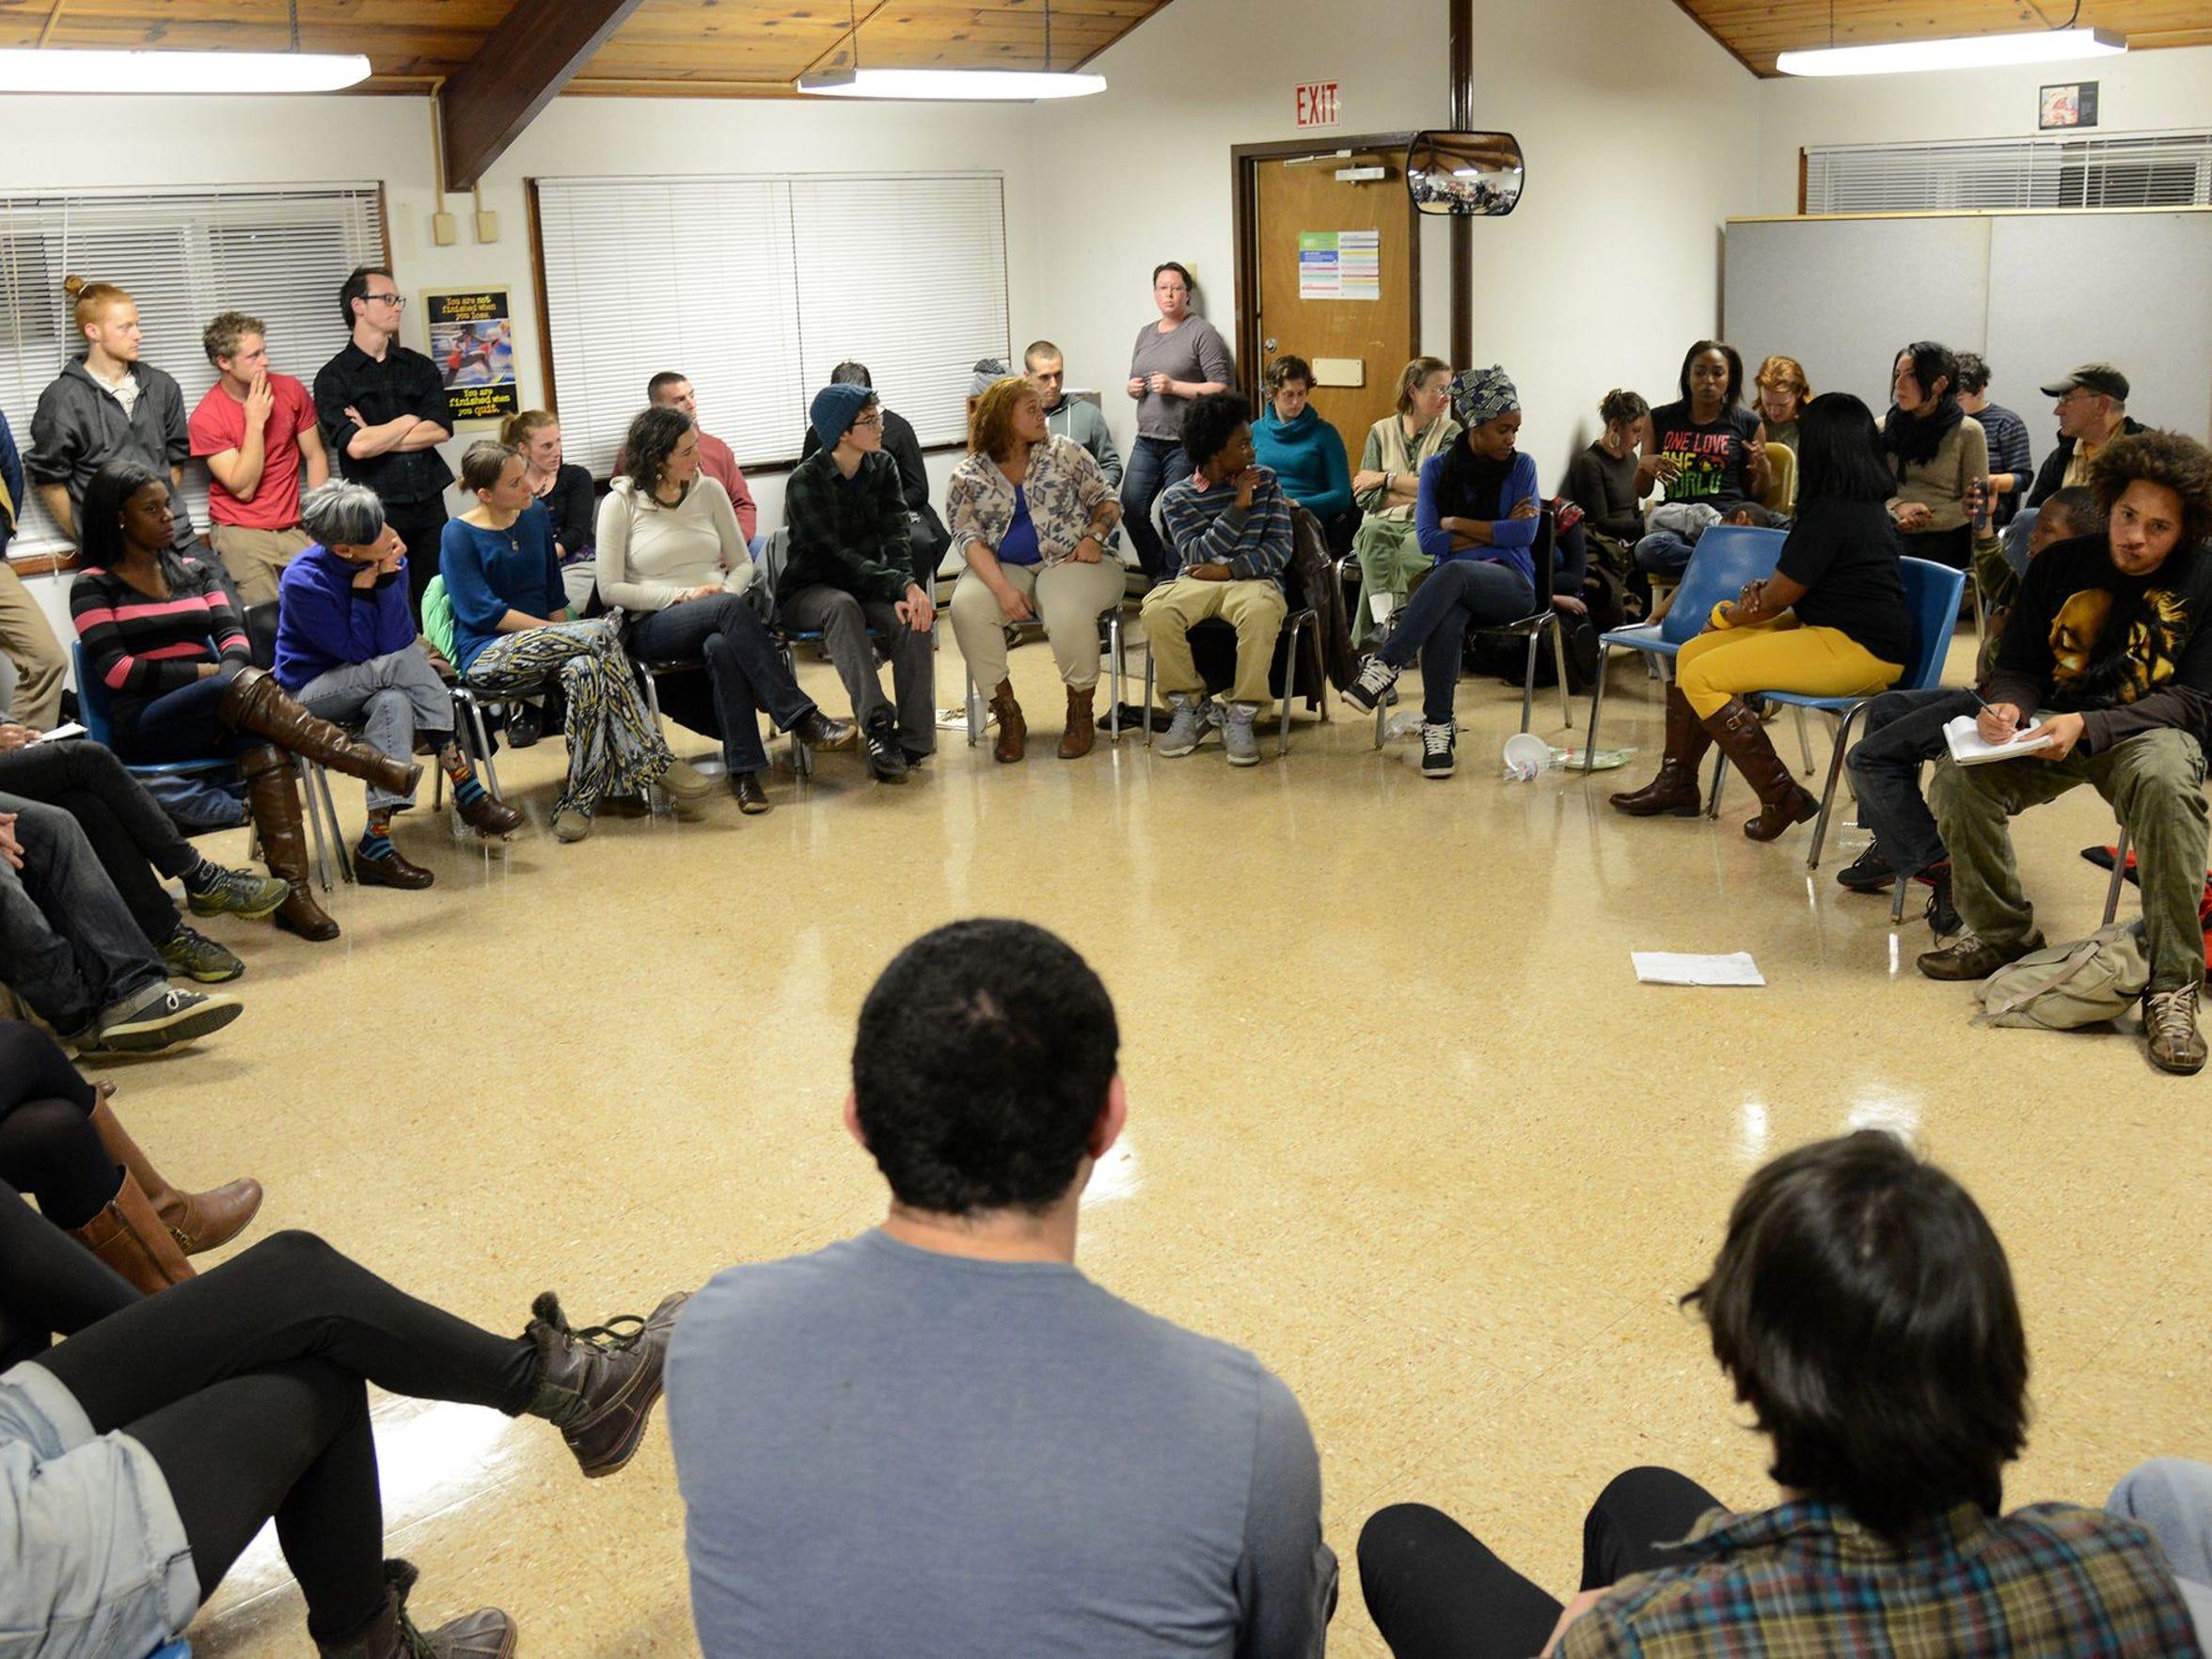 The HoodTalk forum at Klondyke Homes brought together